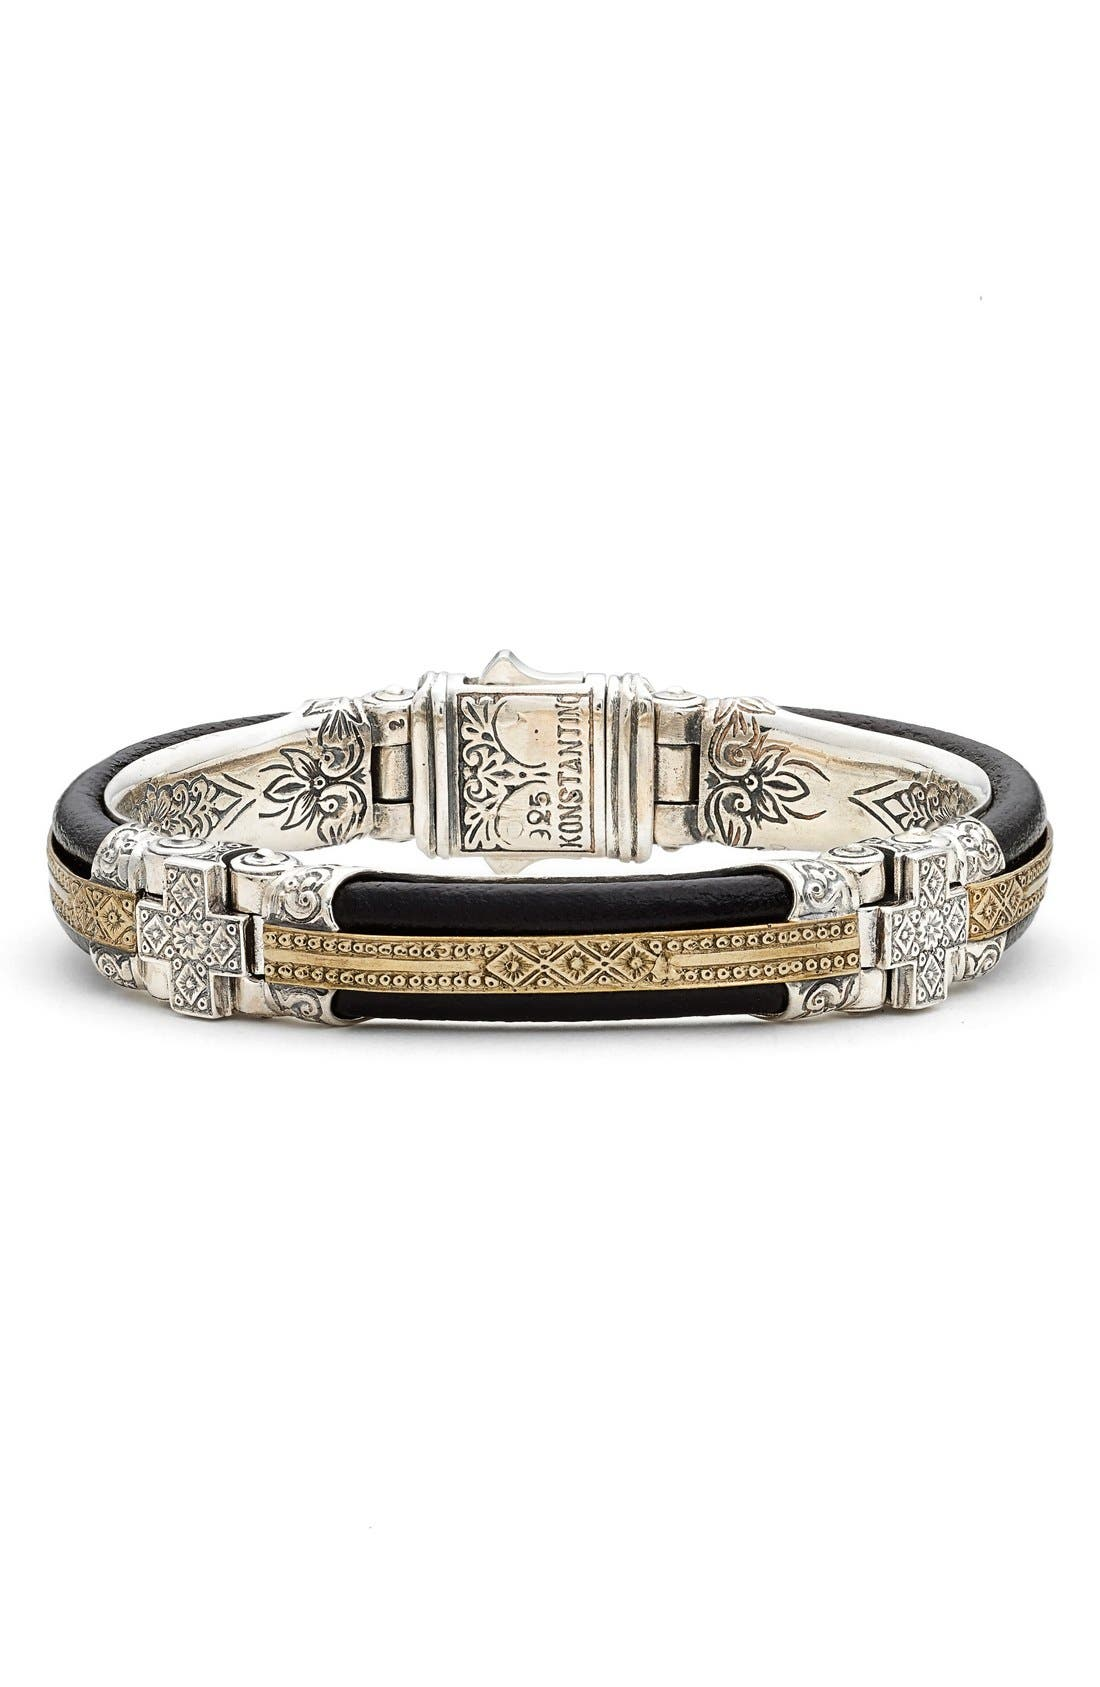 Byzantium Etched Sterling Silver Bracelet,                         Main,                         color, Black